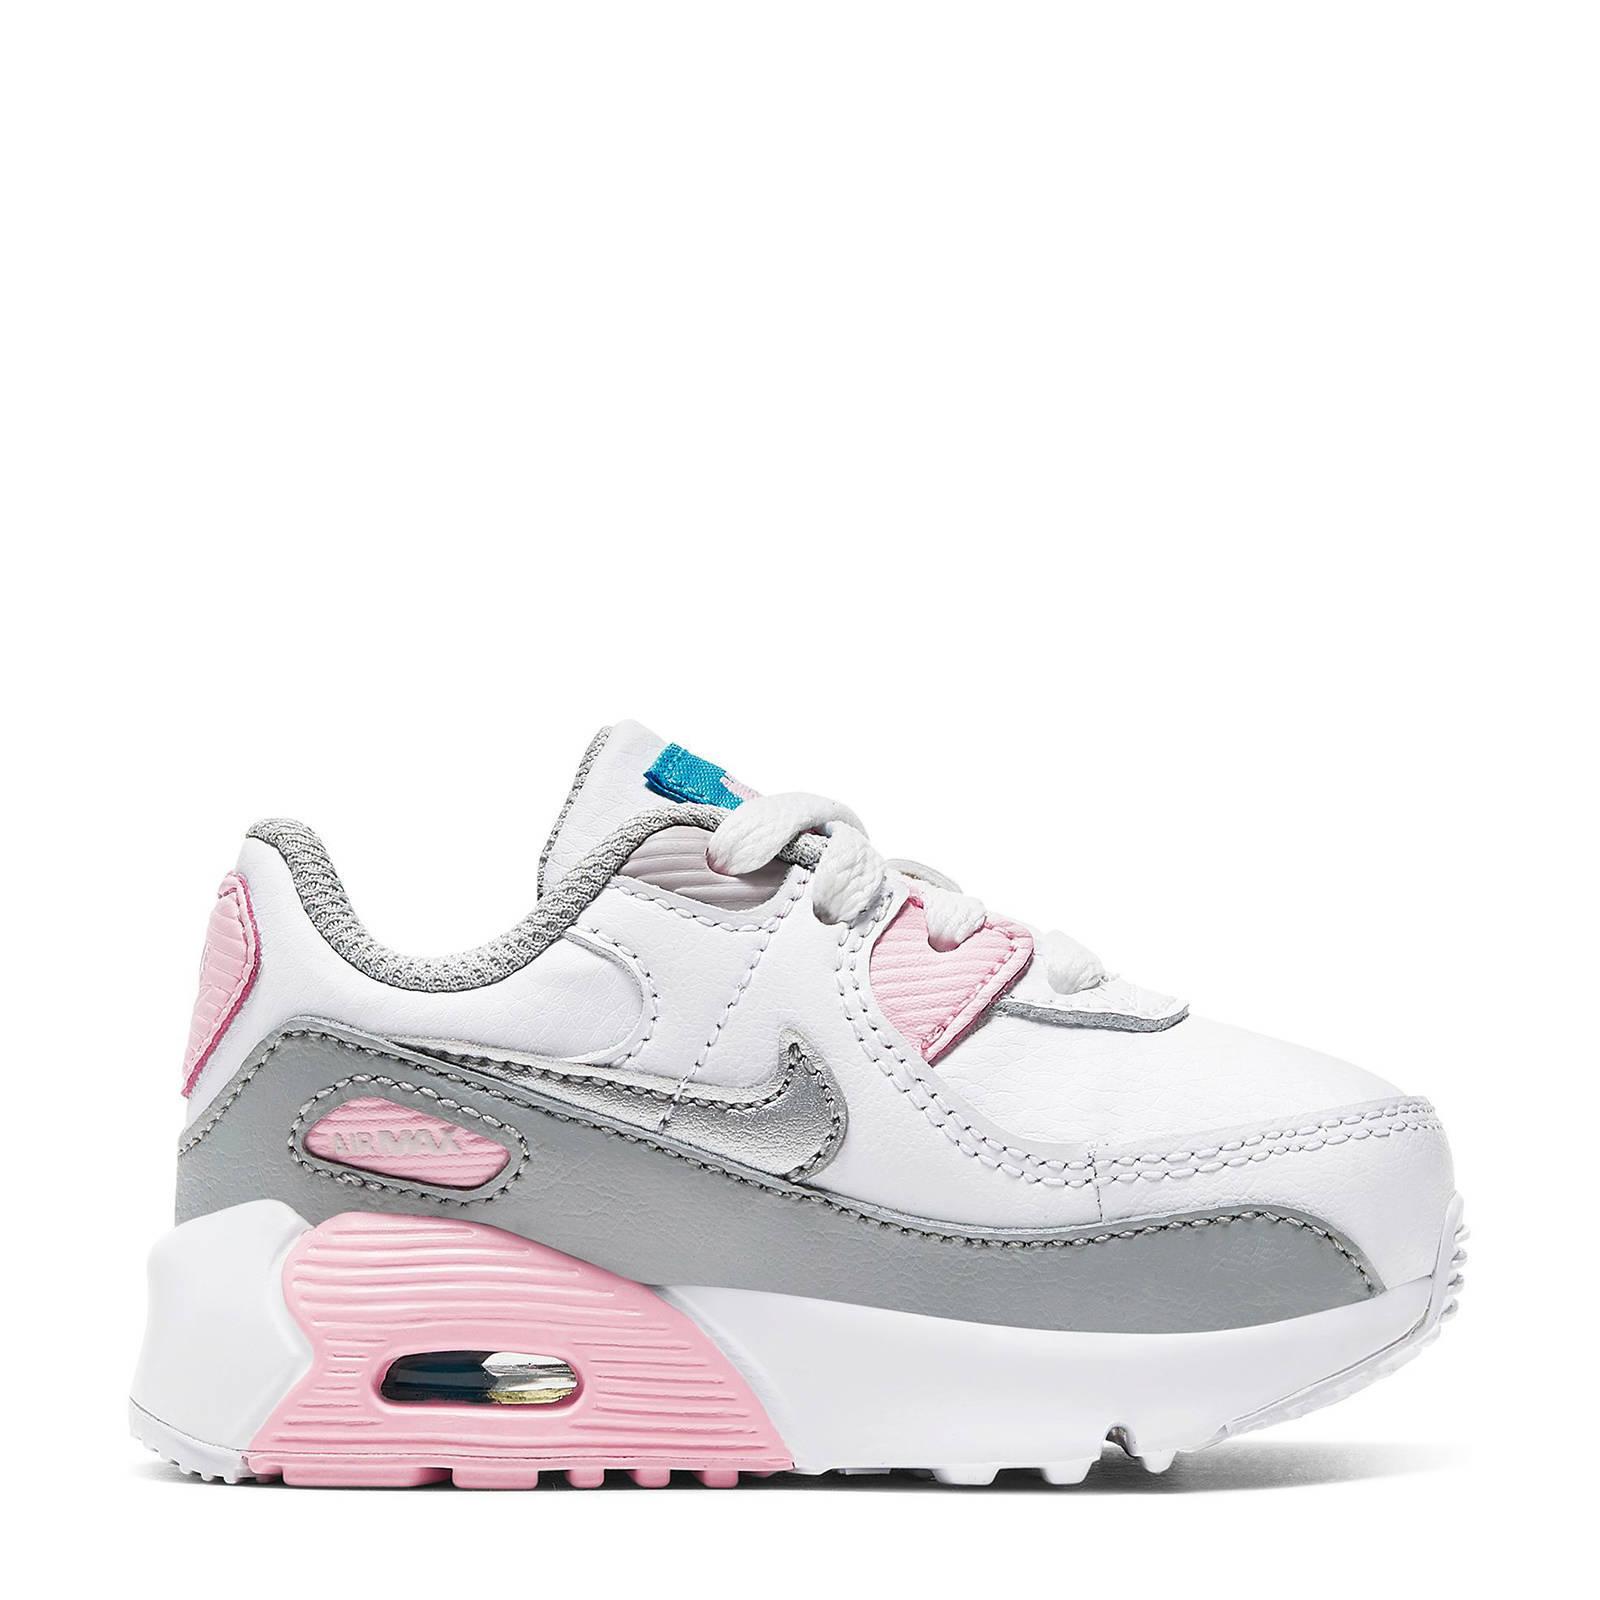 nike air max 90 roze grijs